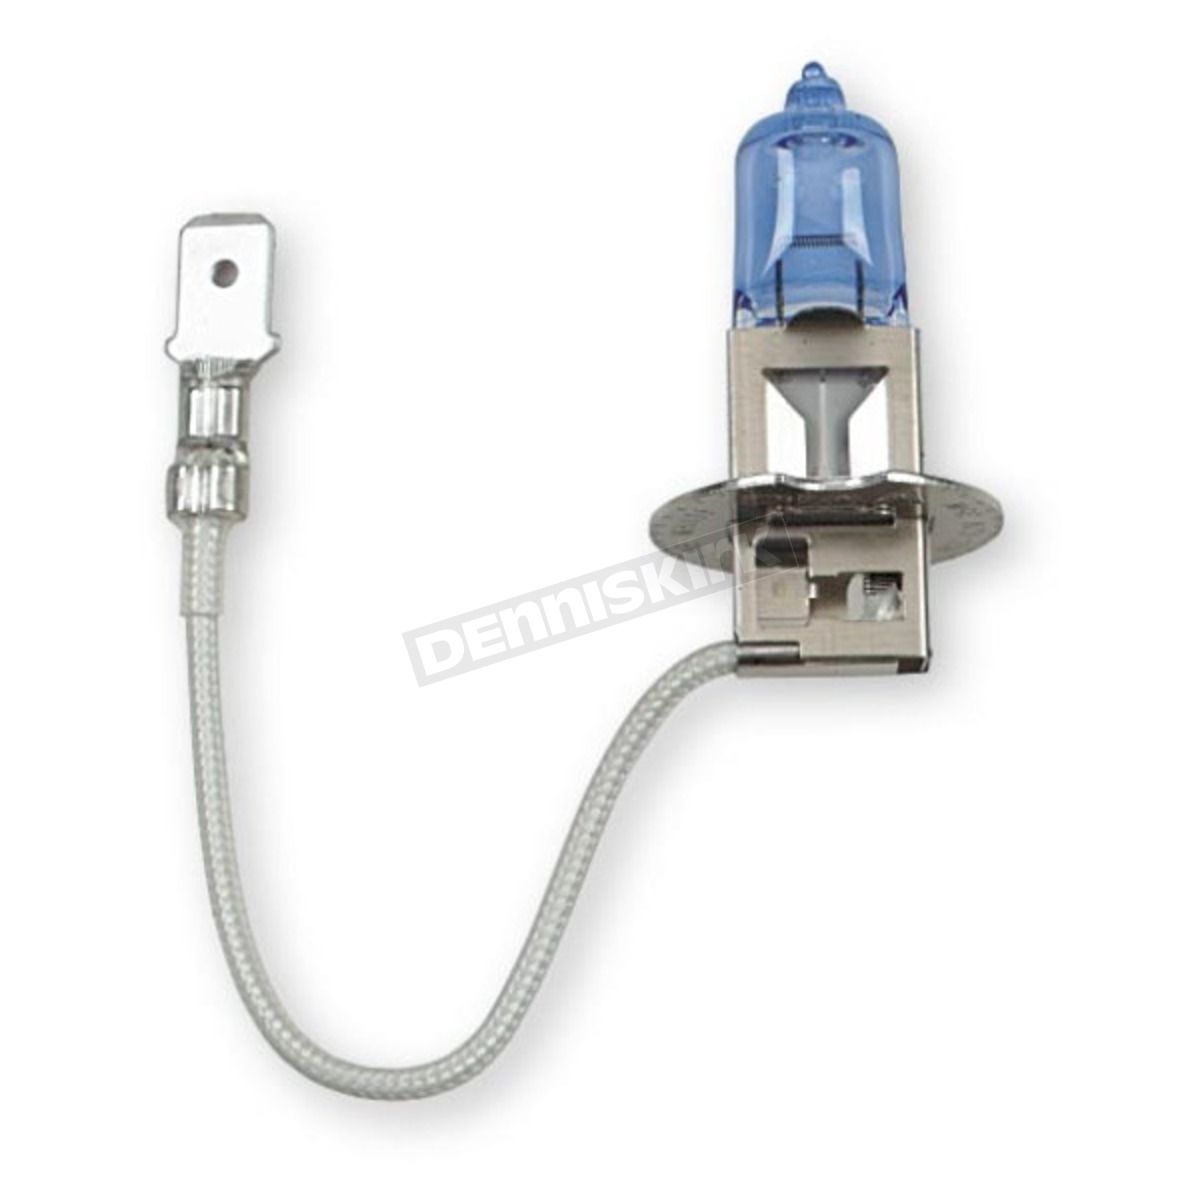 hight resolution of h3 headlight bulb xtreme white 70325